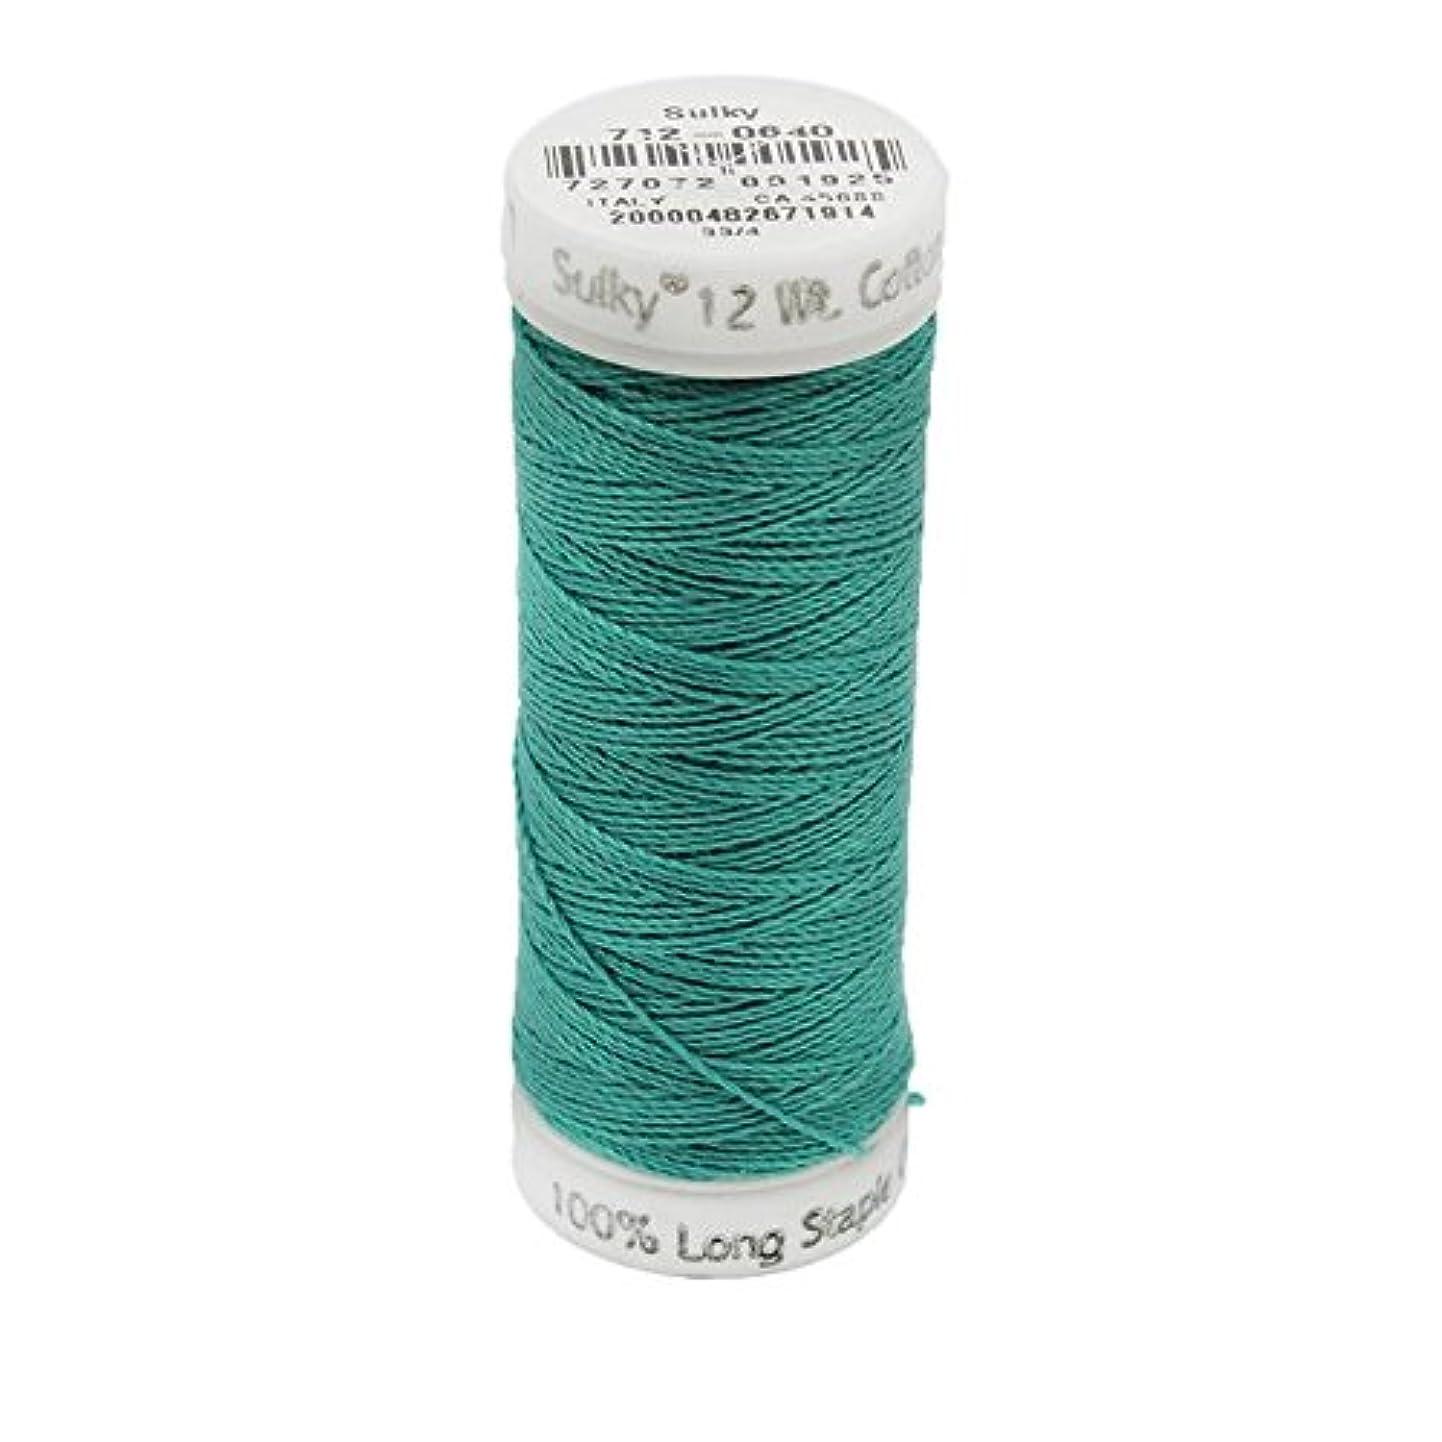 Sulky Of America 12wt Cotton Petites Thread, 50 yd, Medium Aqua hnmvfmxebed4